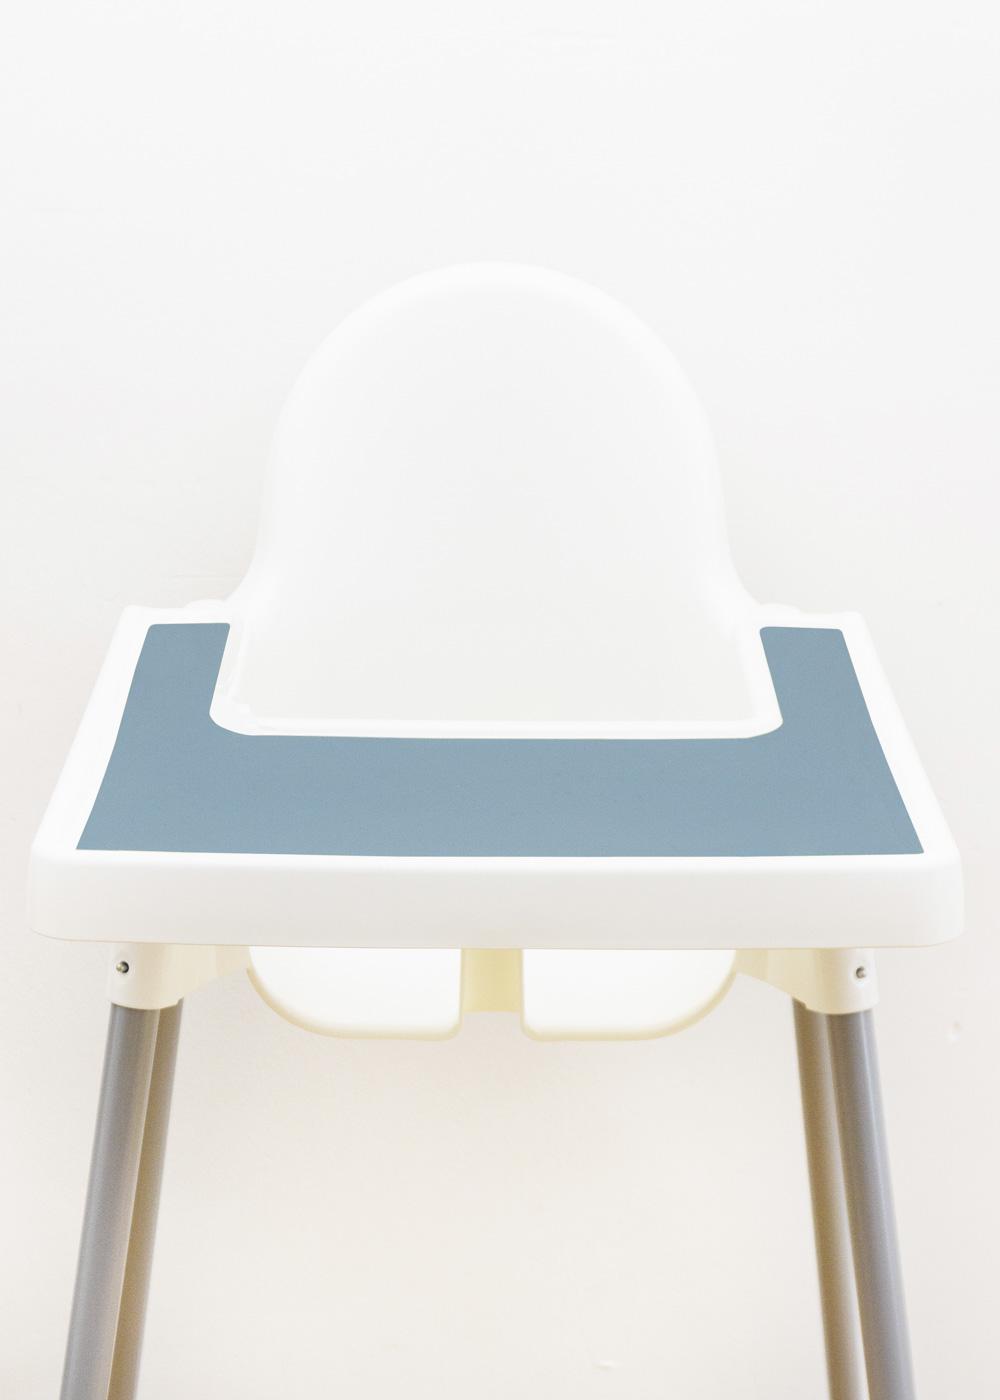 Silikonmatte Ikea Antilop Hochstuhl Klecka Mat nordisch blau